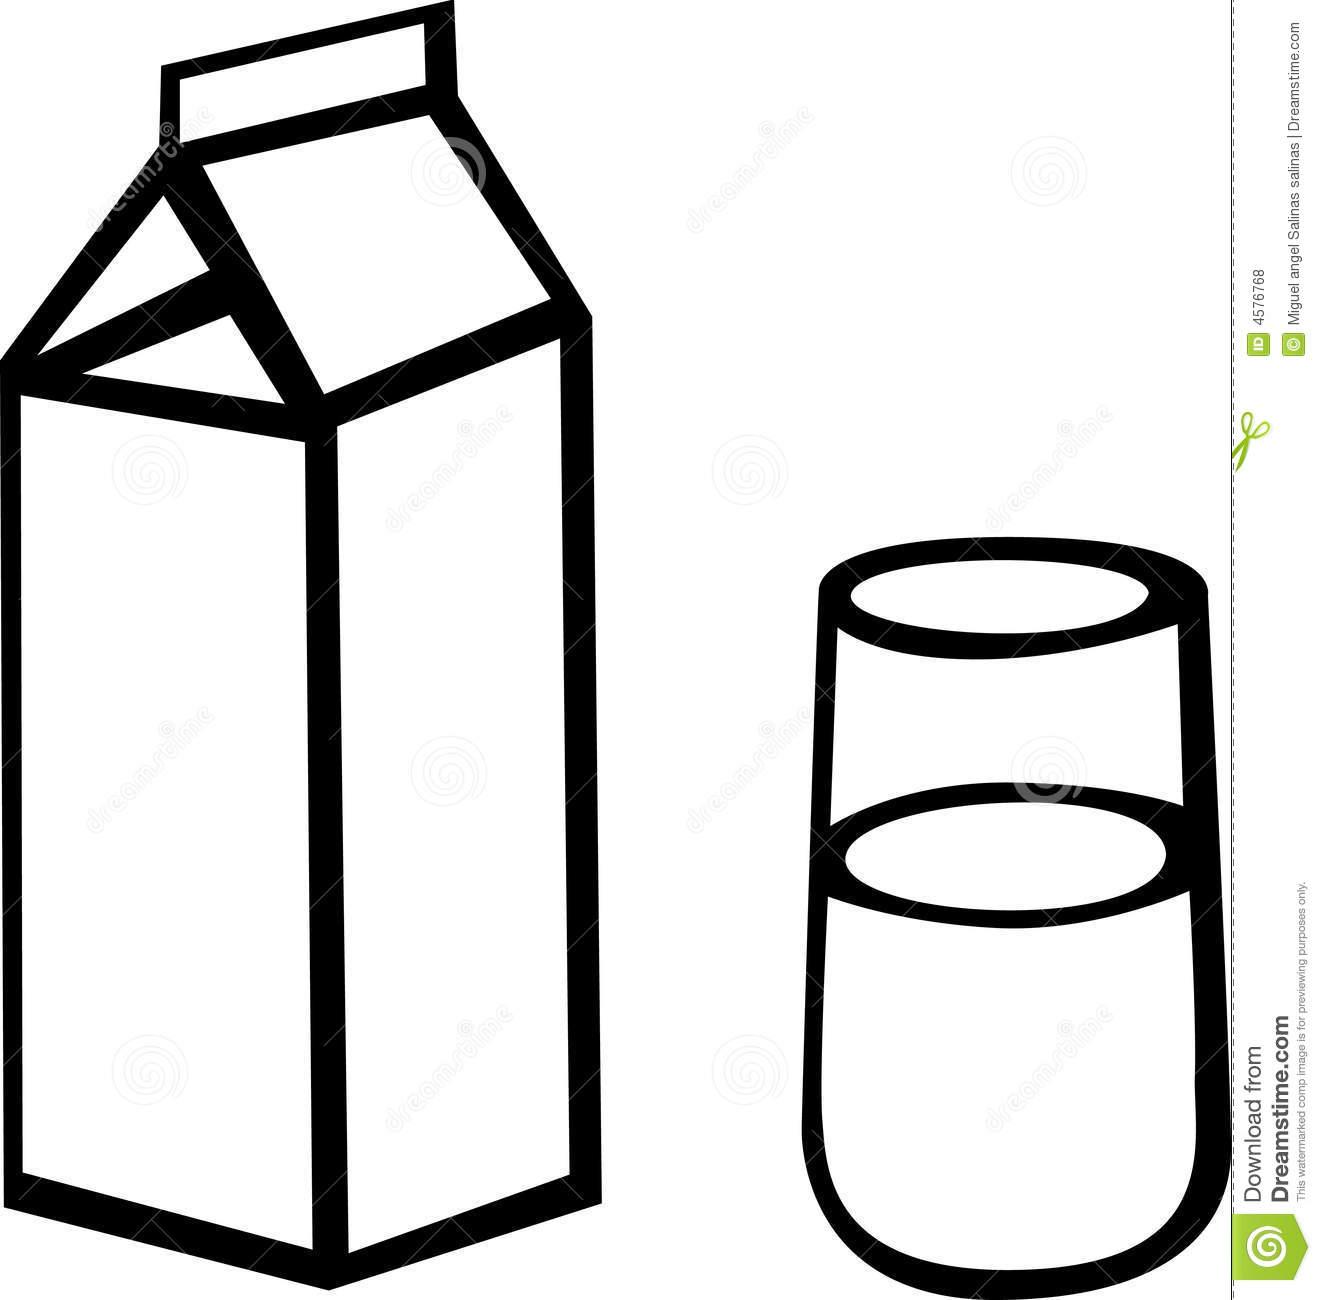 Clip Art Milk Carton Clip Art chocolate milk carton clipart kid glass vector illustration 4576768